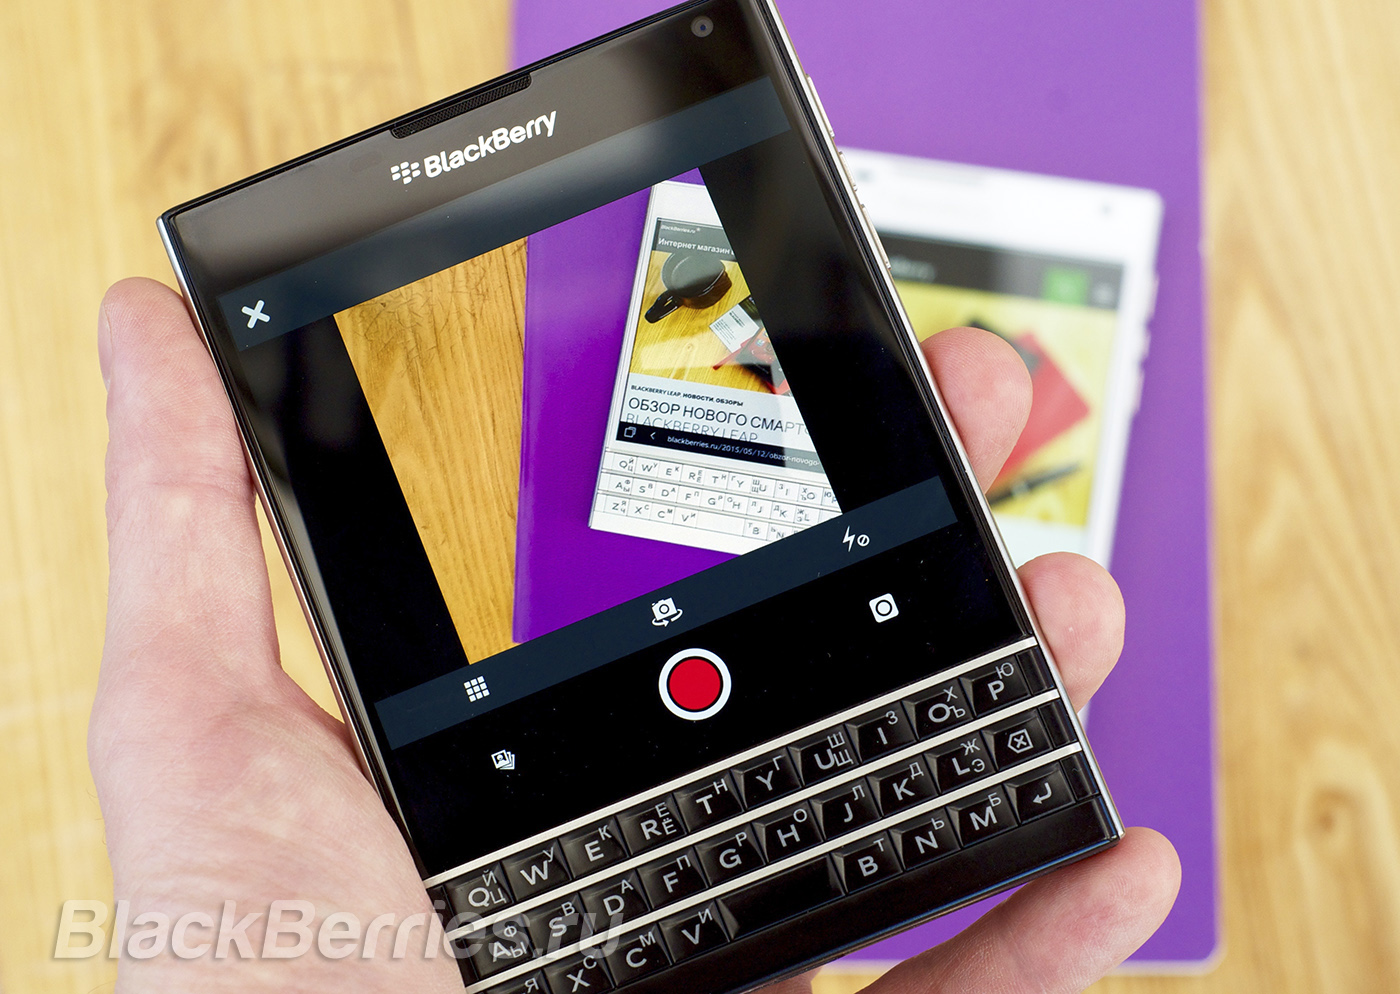 BlackBerry-Passport-20-05-14